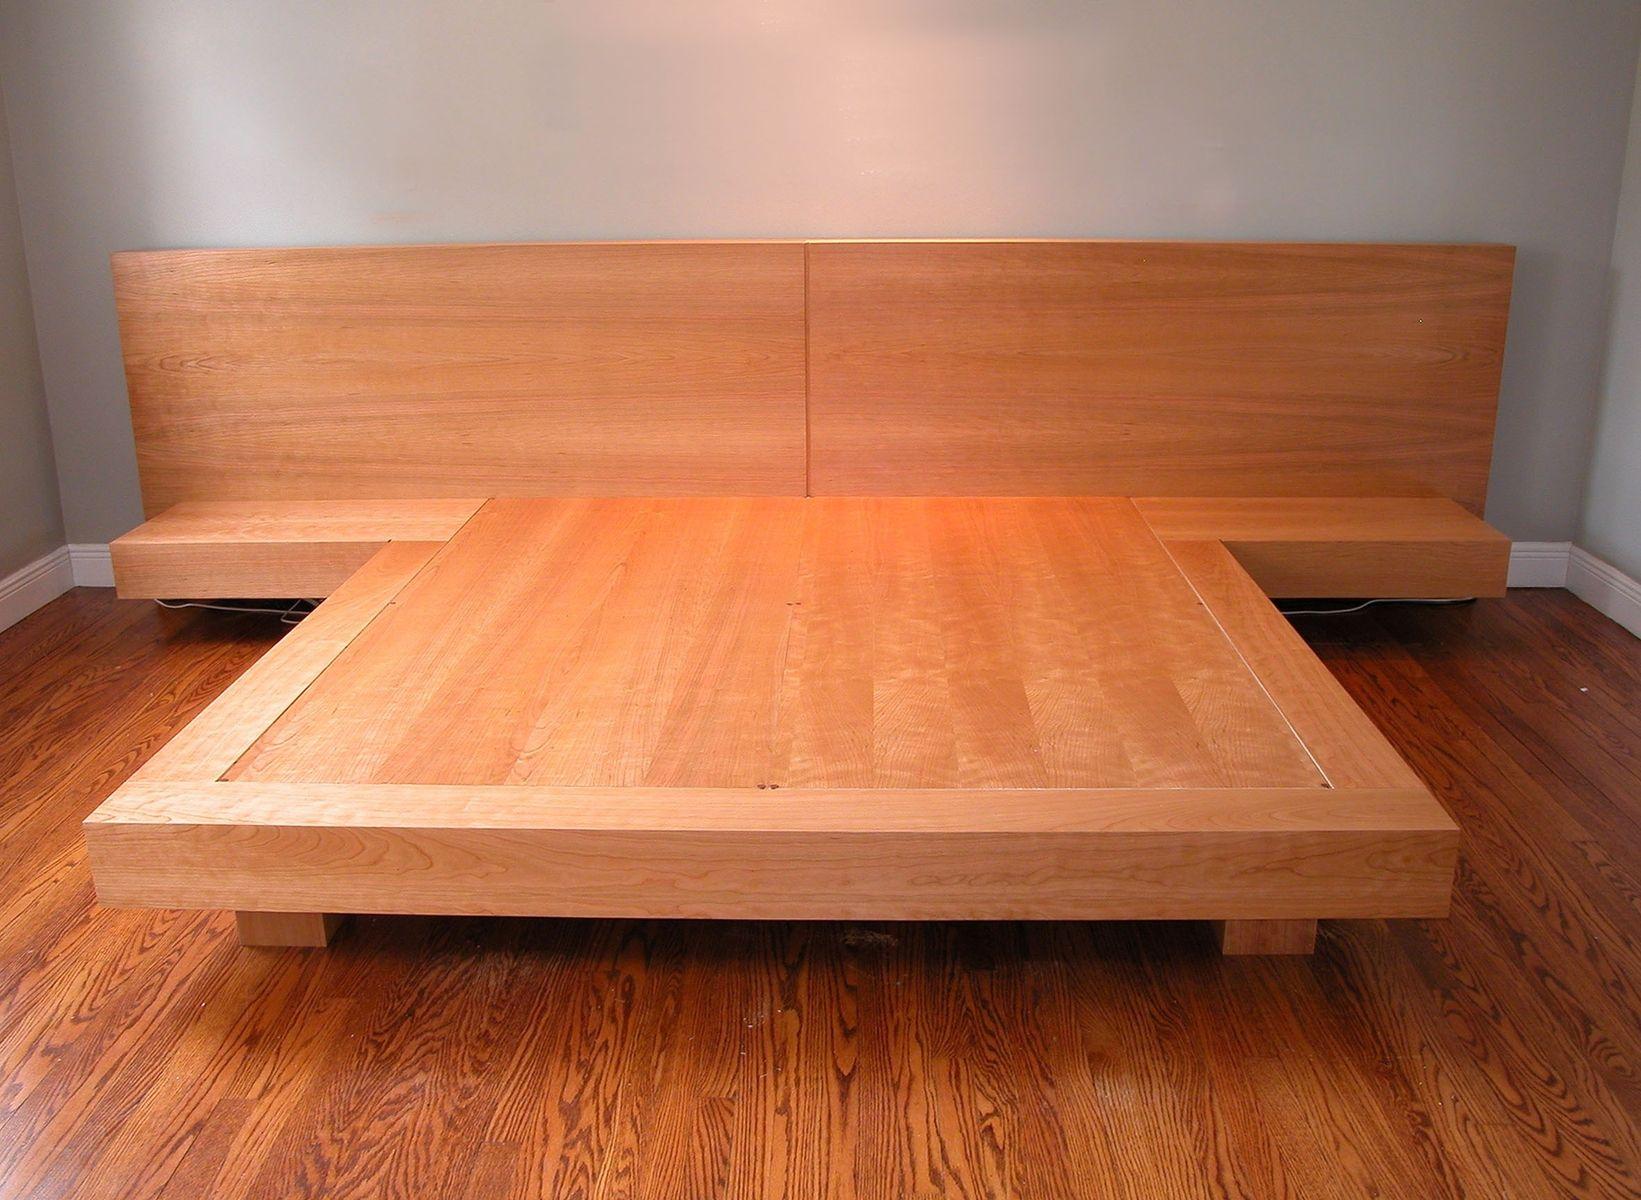 Custom King Size Platform Bed By Ezequiel Rotstain Design Fabrication Llc Custommade Com